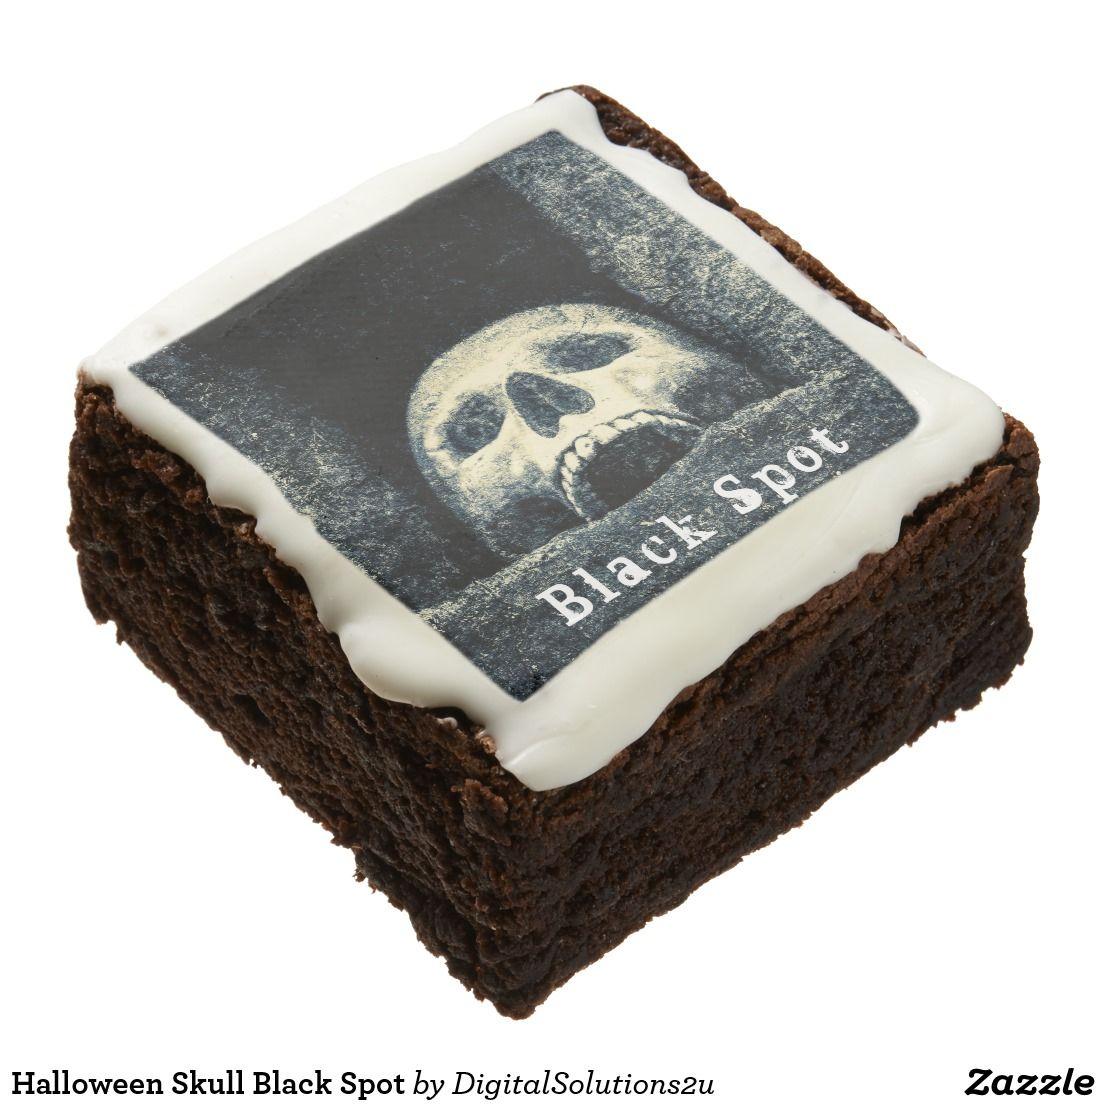 Halloween skull black spot brownie